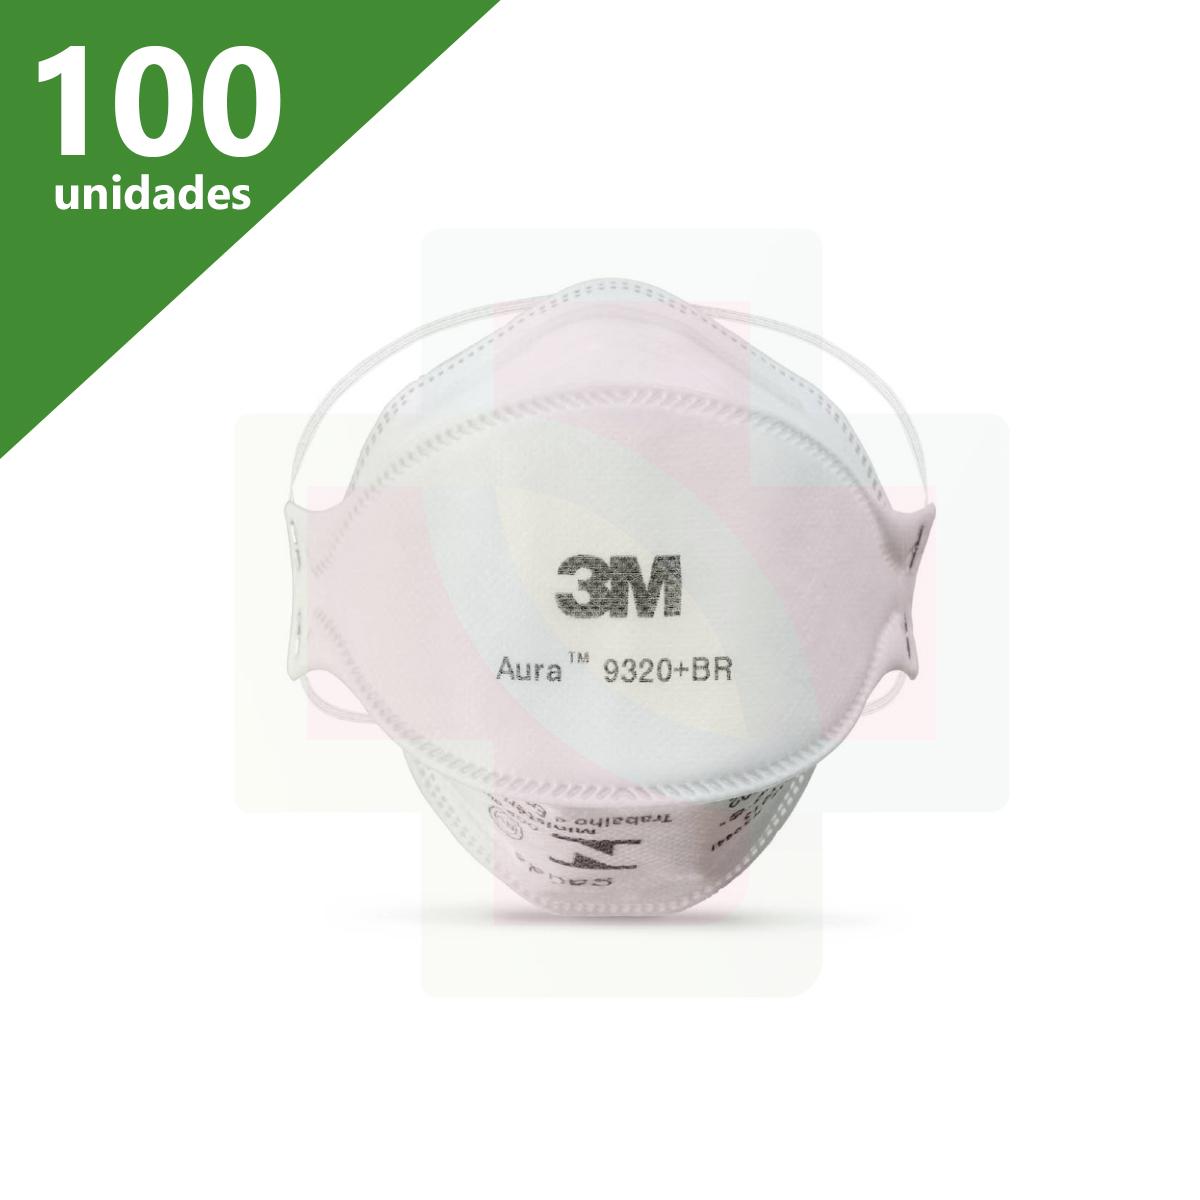 MÁSCARA DE PROTEÇÃO PFF2 AURA 9320+BR (KIT C/100 UNDS) - 3M